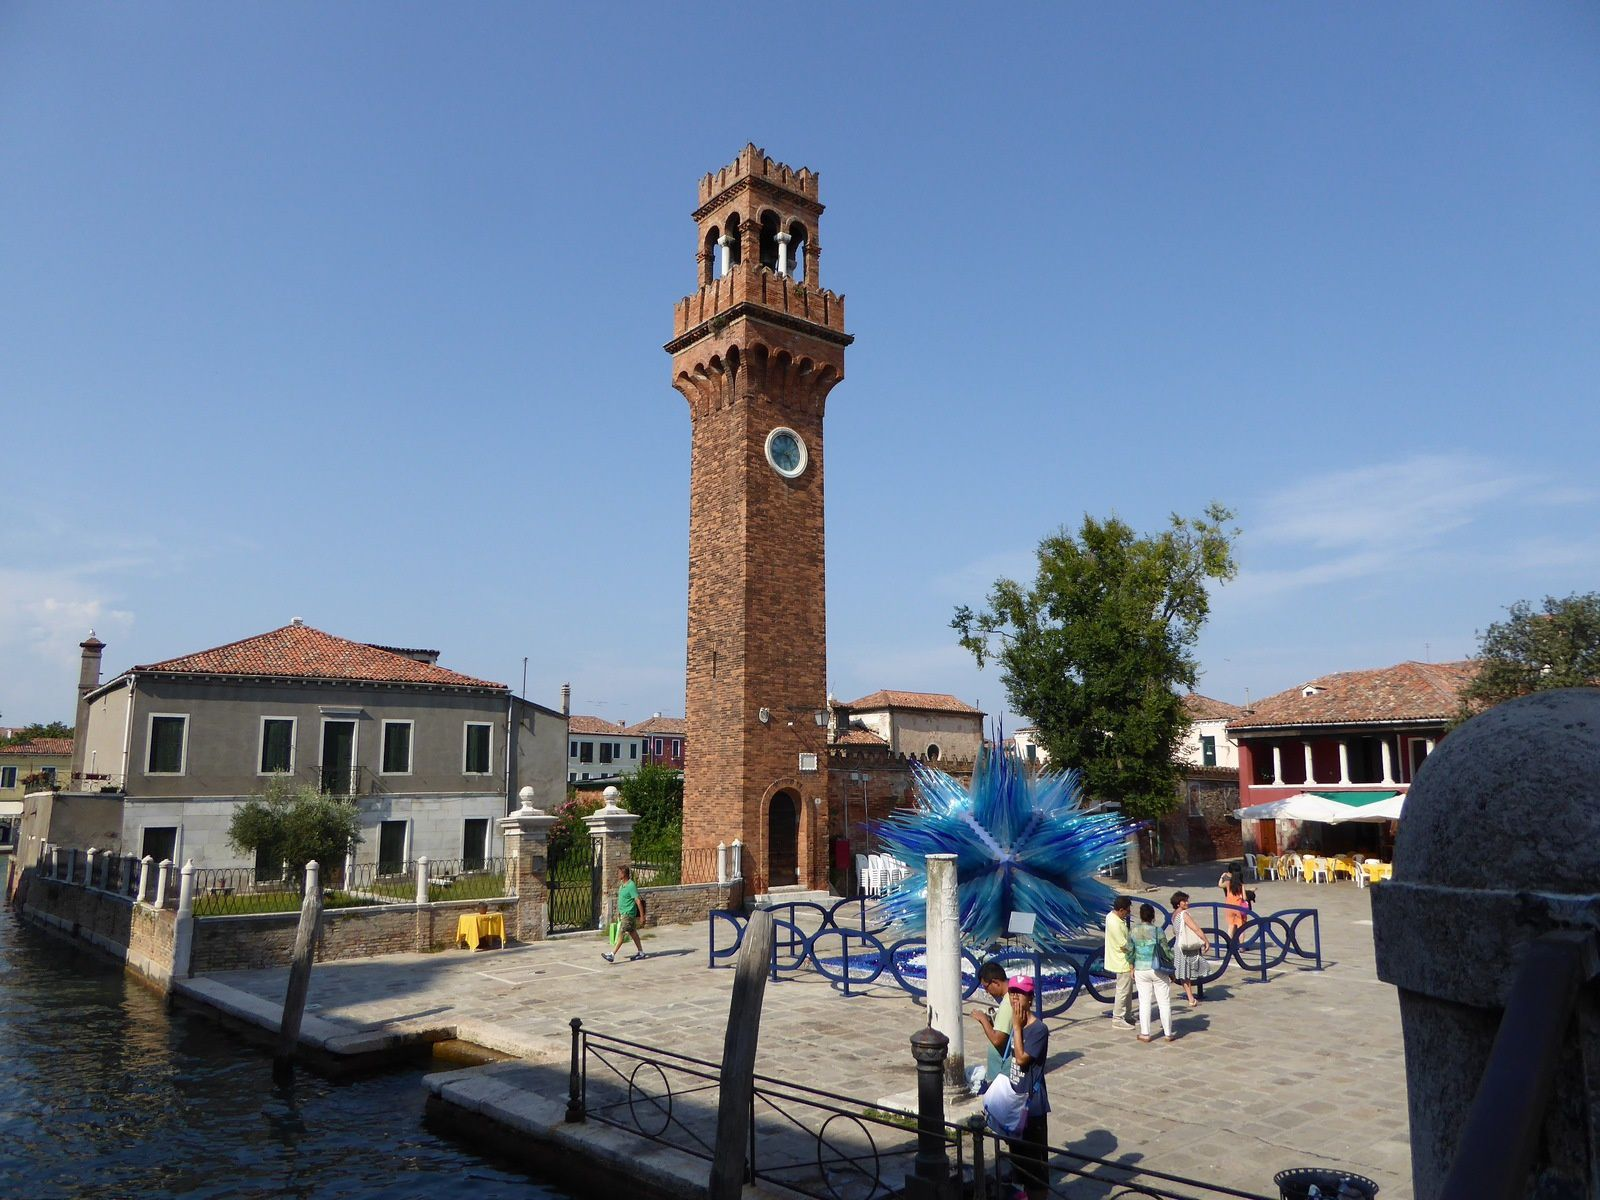 Venise-Murano - Italie été 2015.